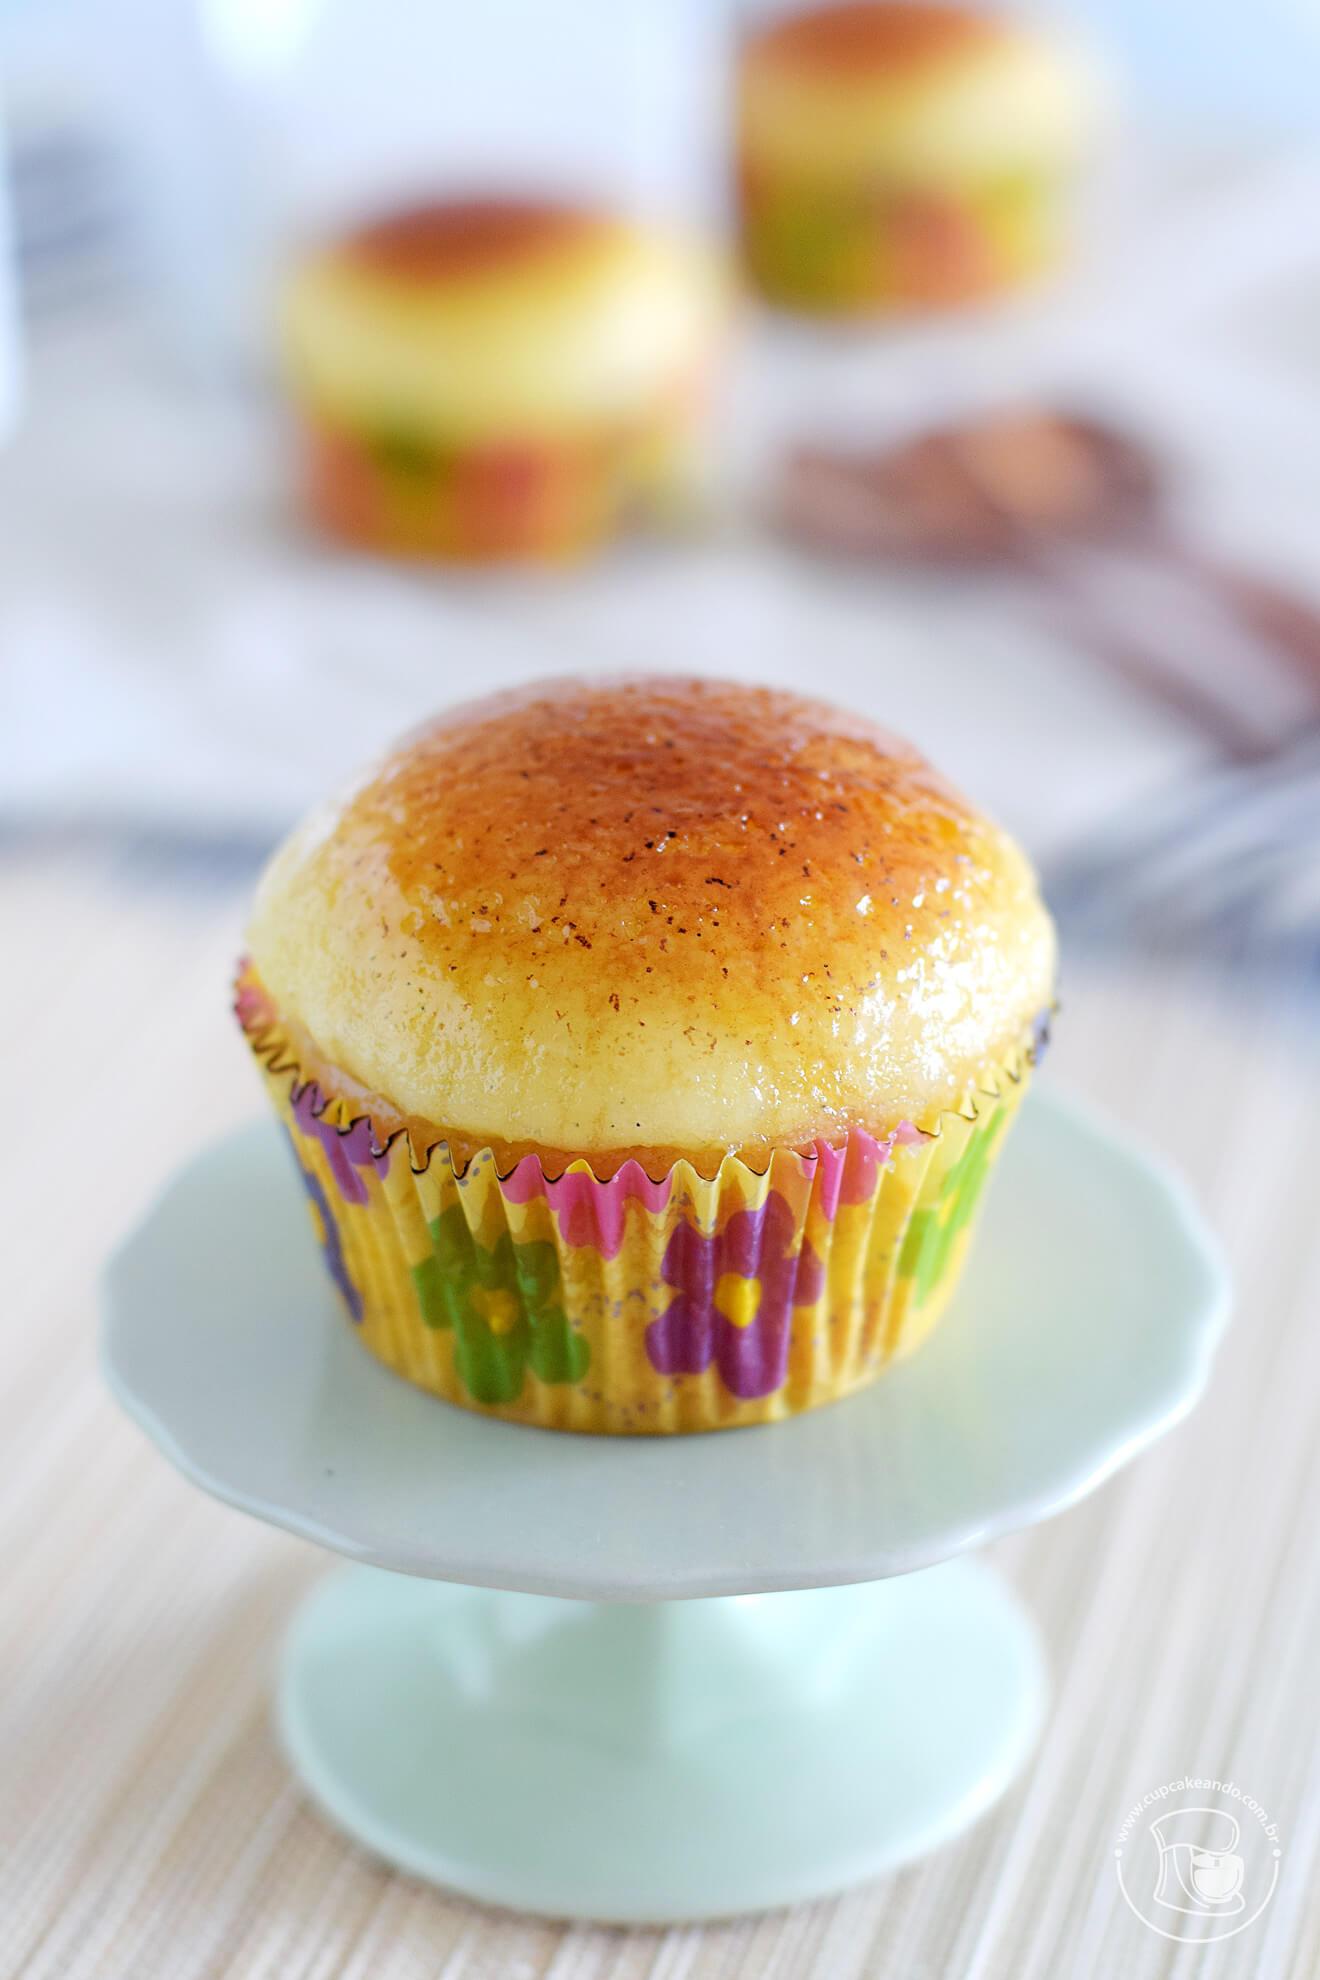 Cupcakes de creme brulee